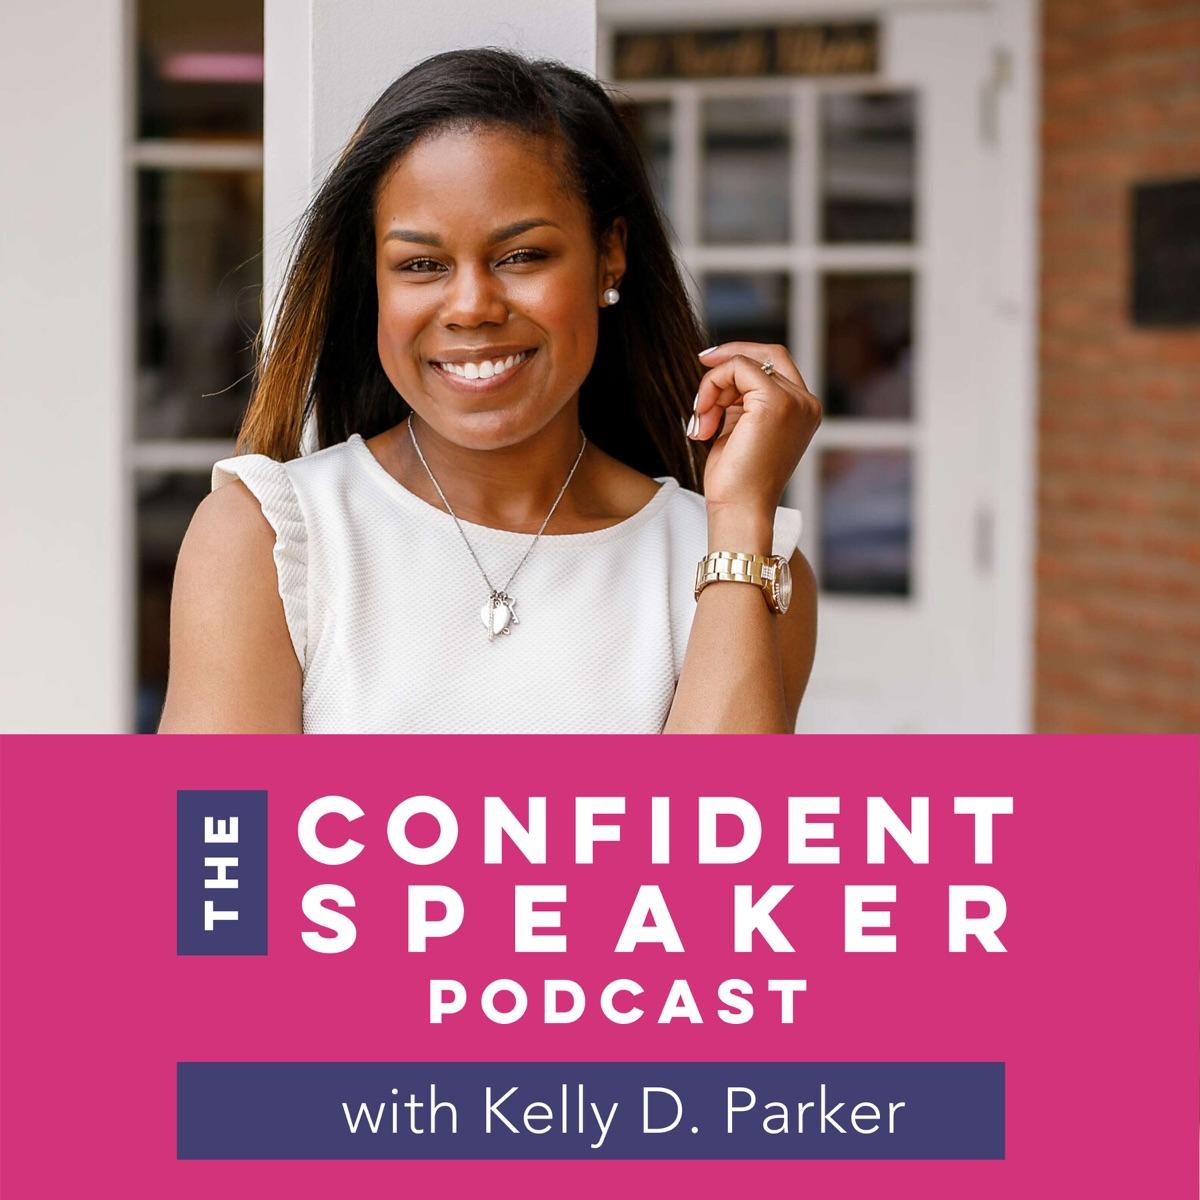 The Confident Speaker Podcast